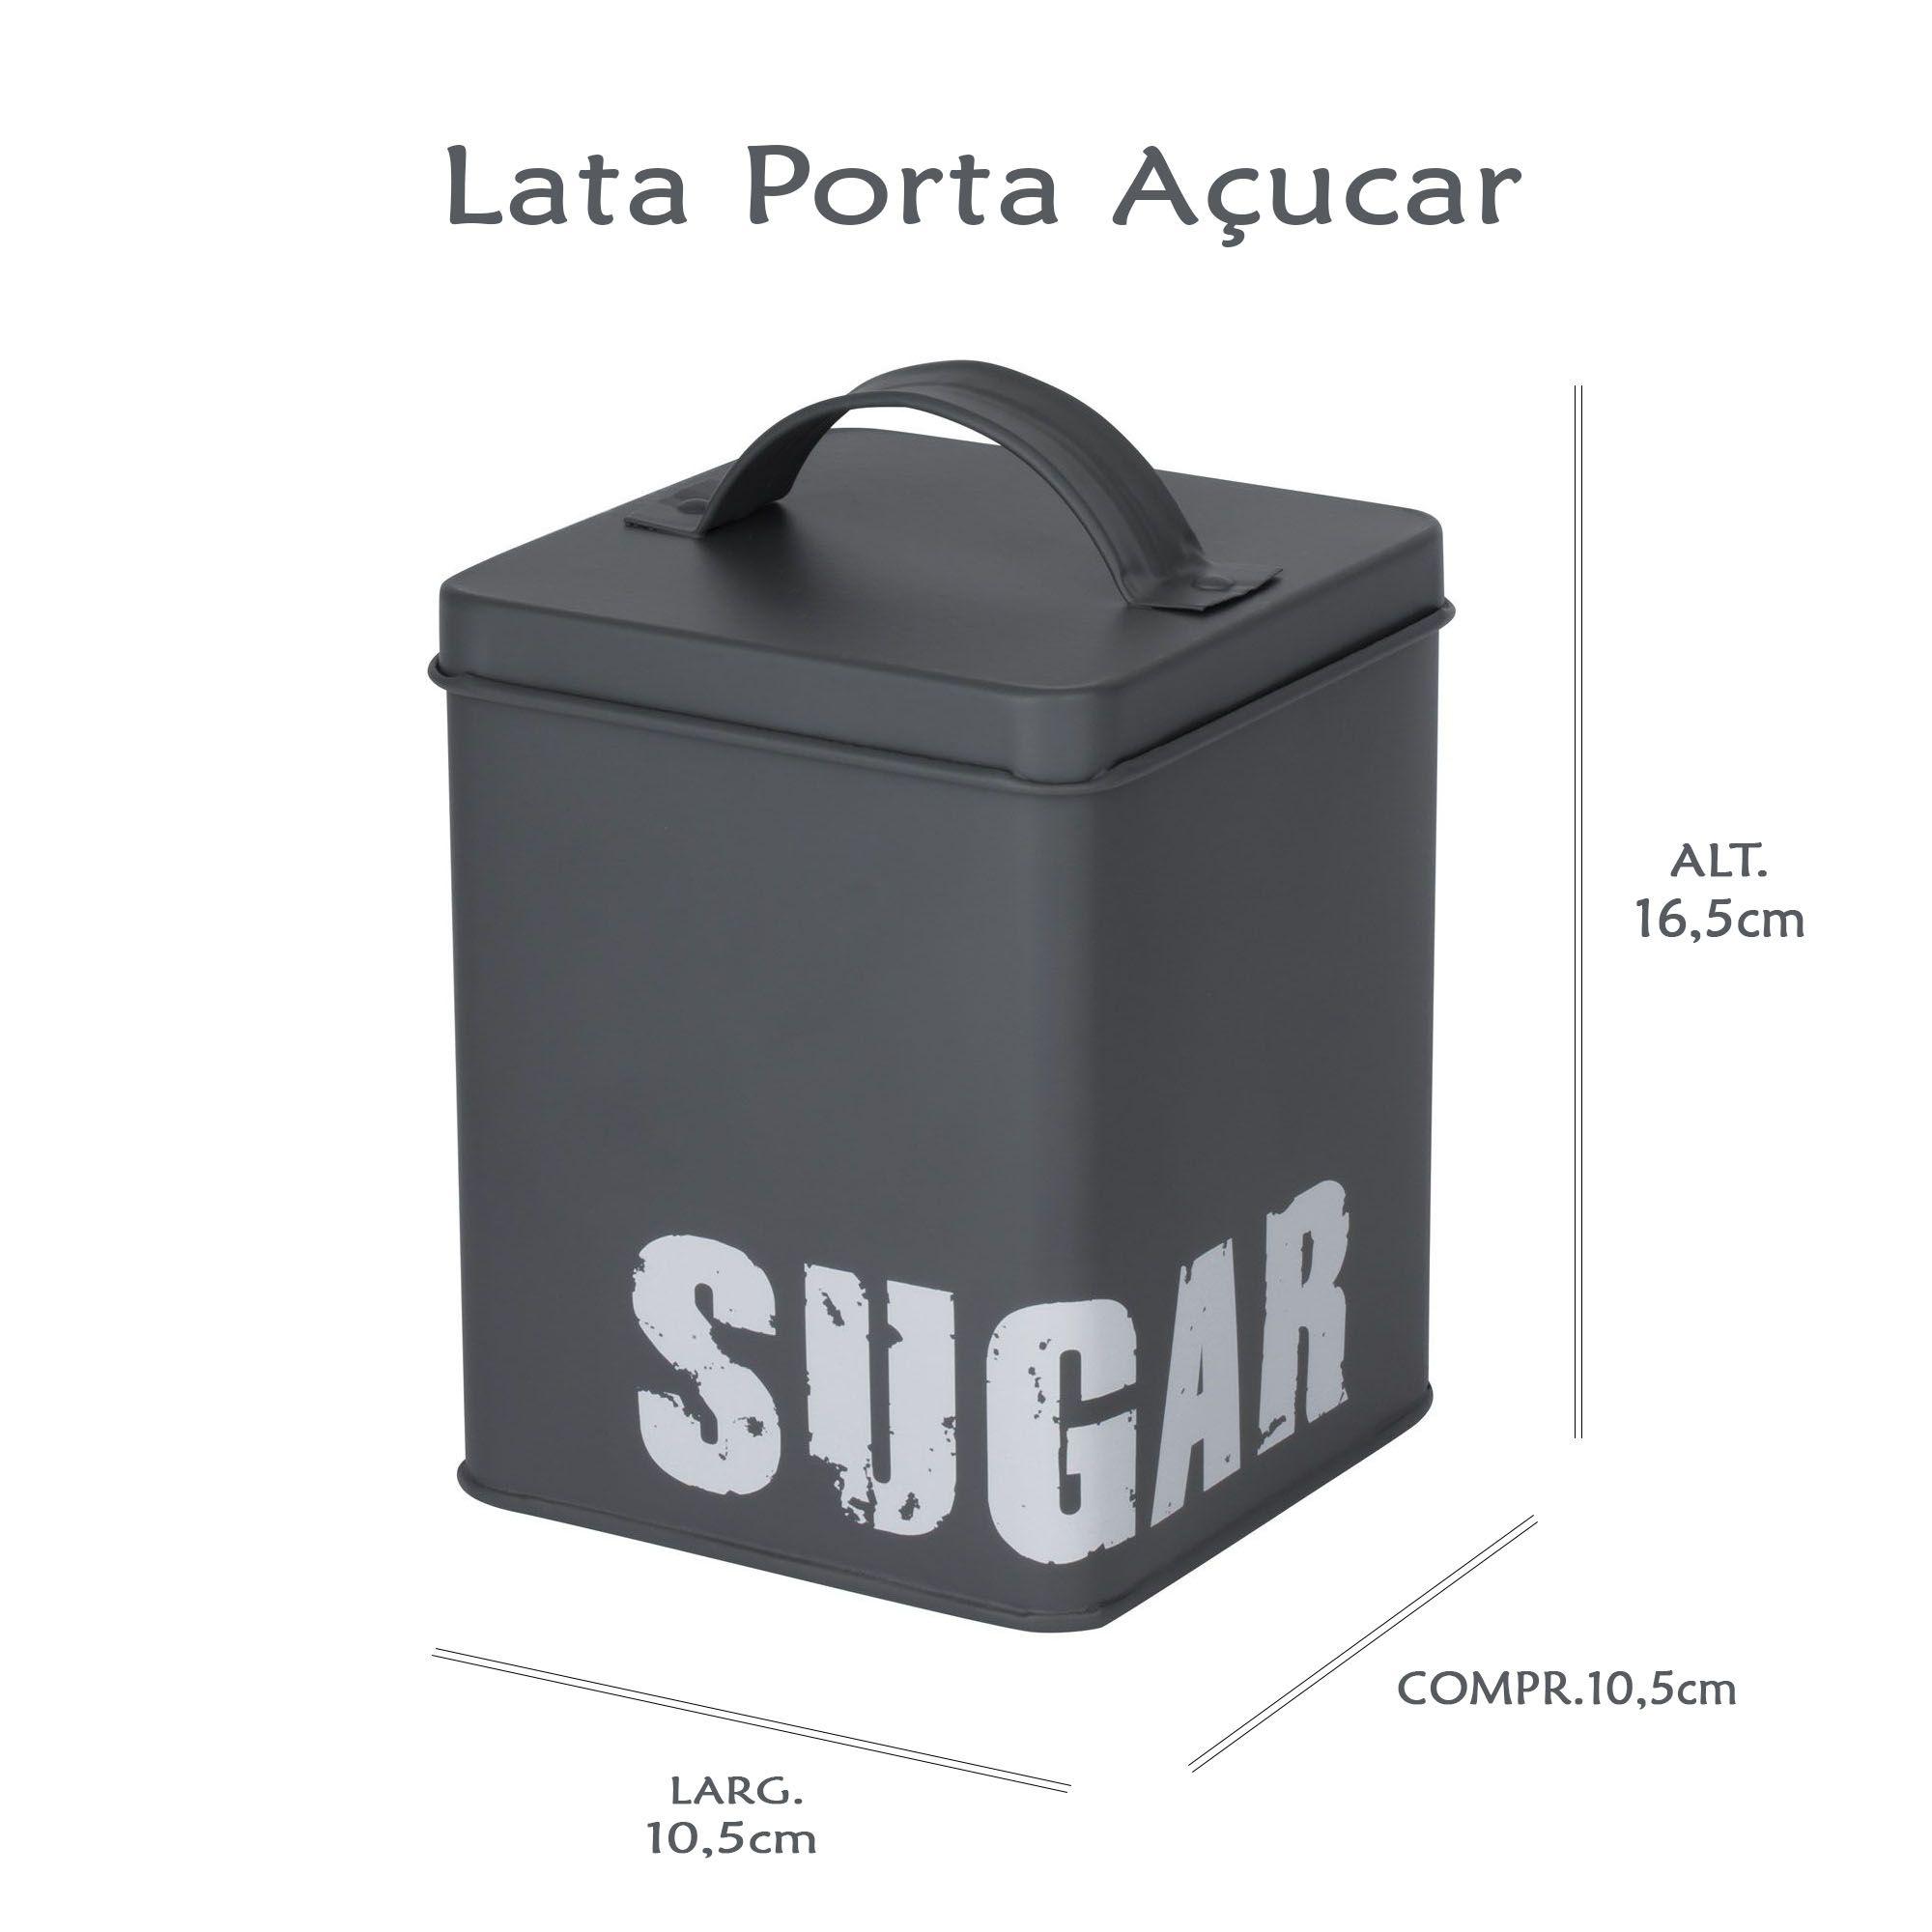 Kit Latas Porta Café e Açúcar Cinza